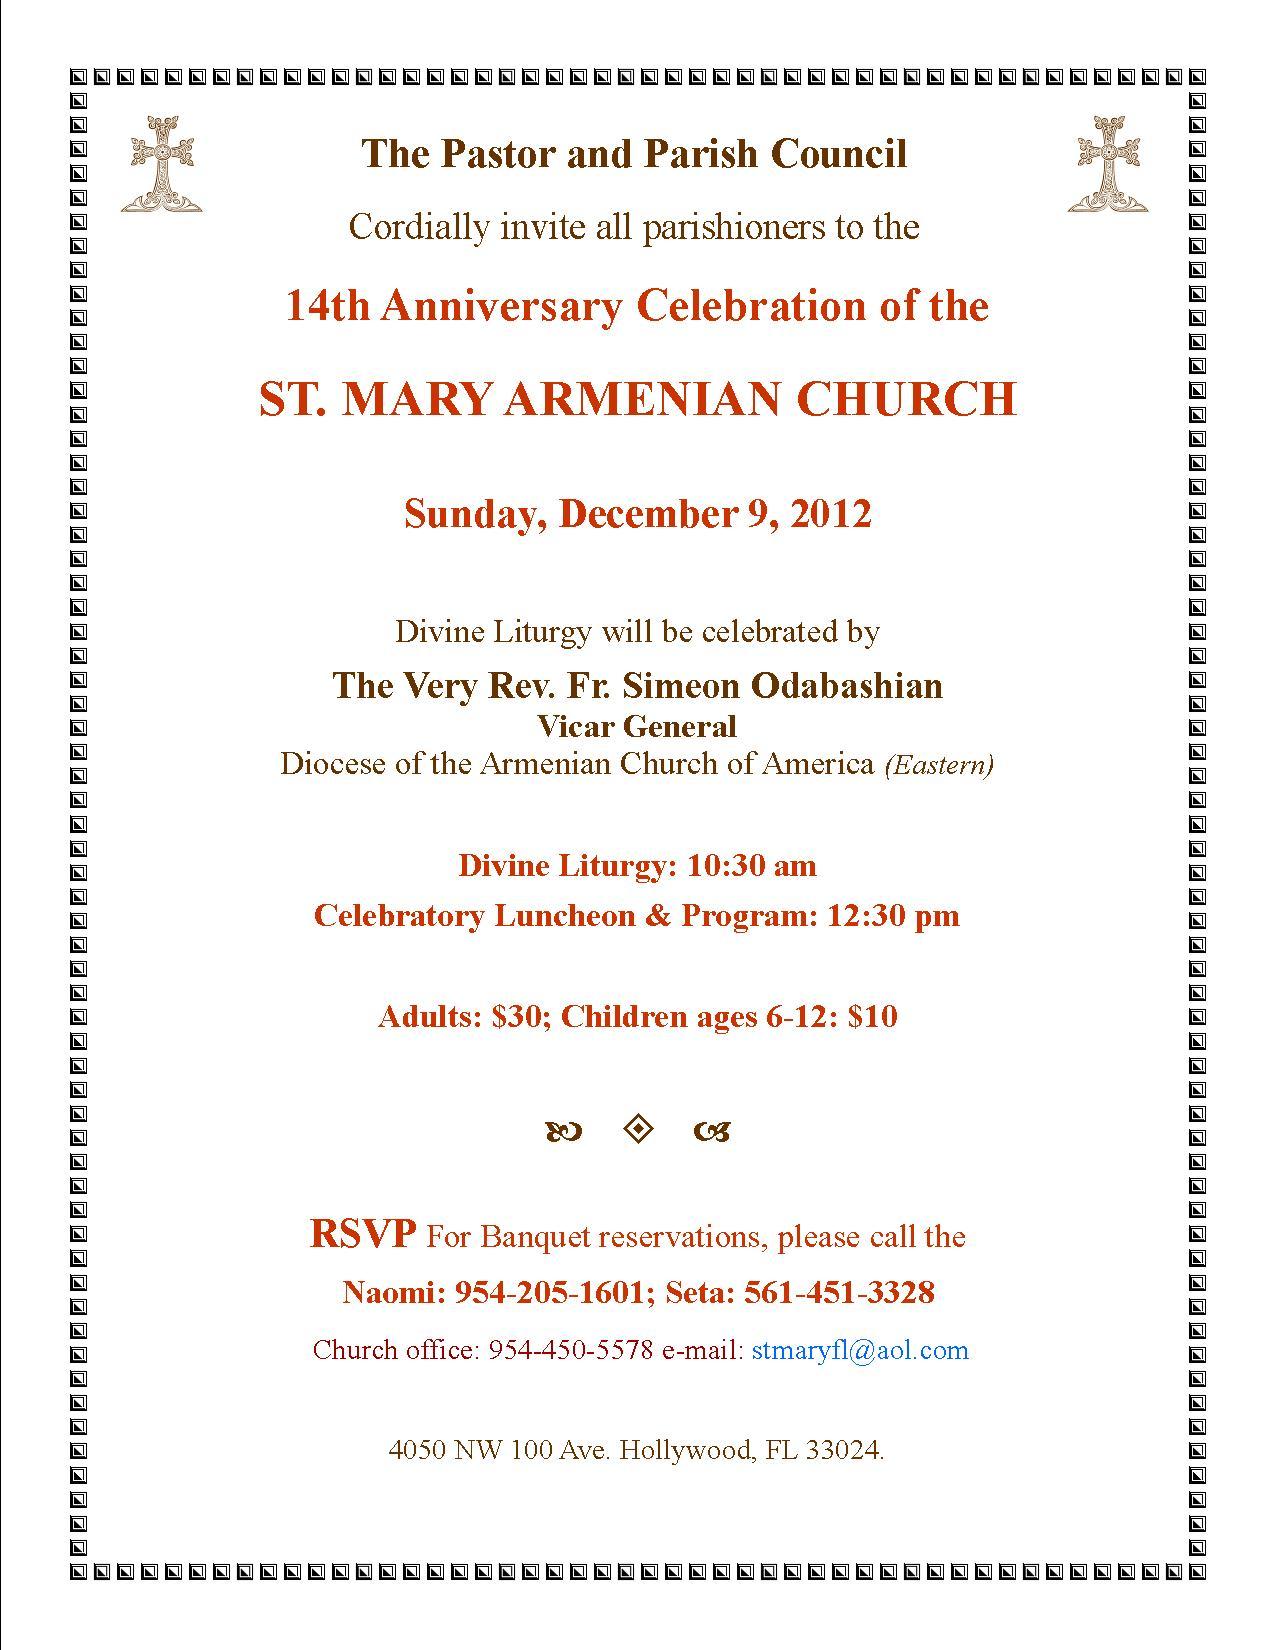 St Mary Armenian Church 14th Anniversary Celebration